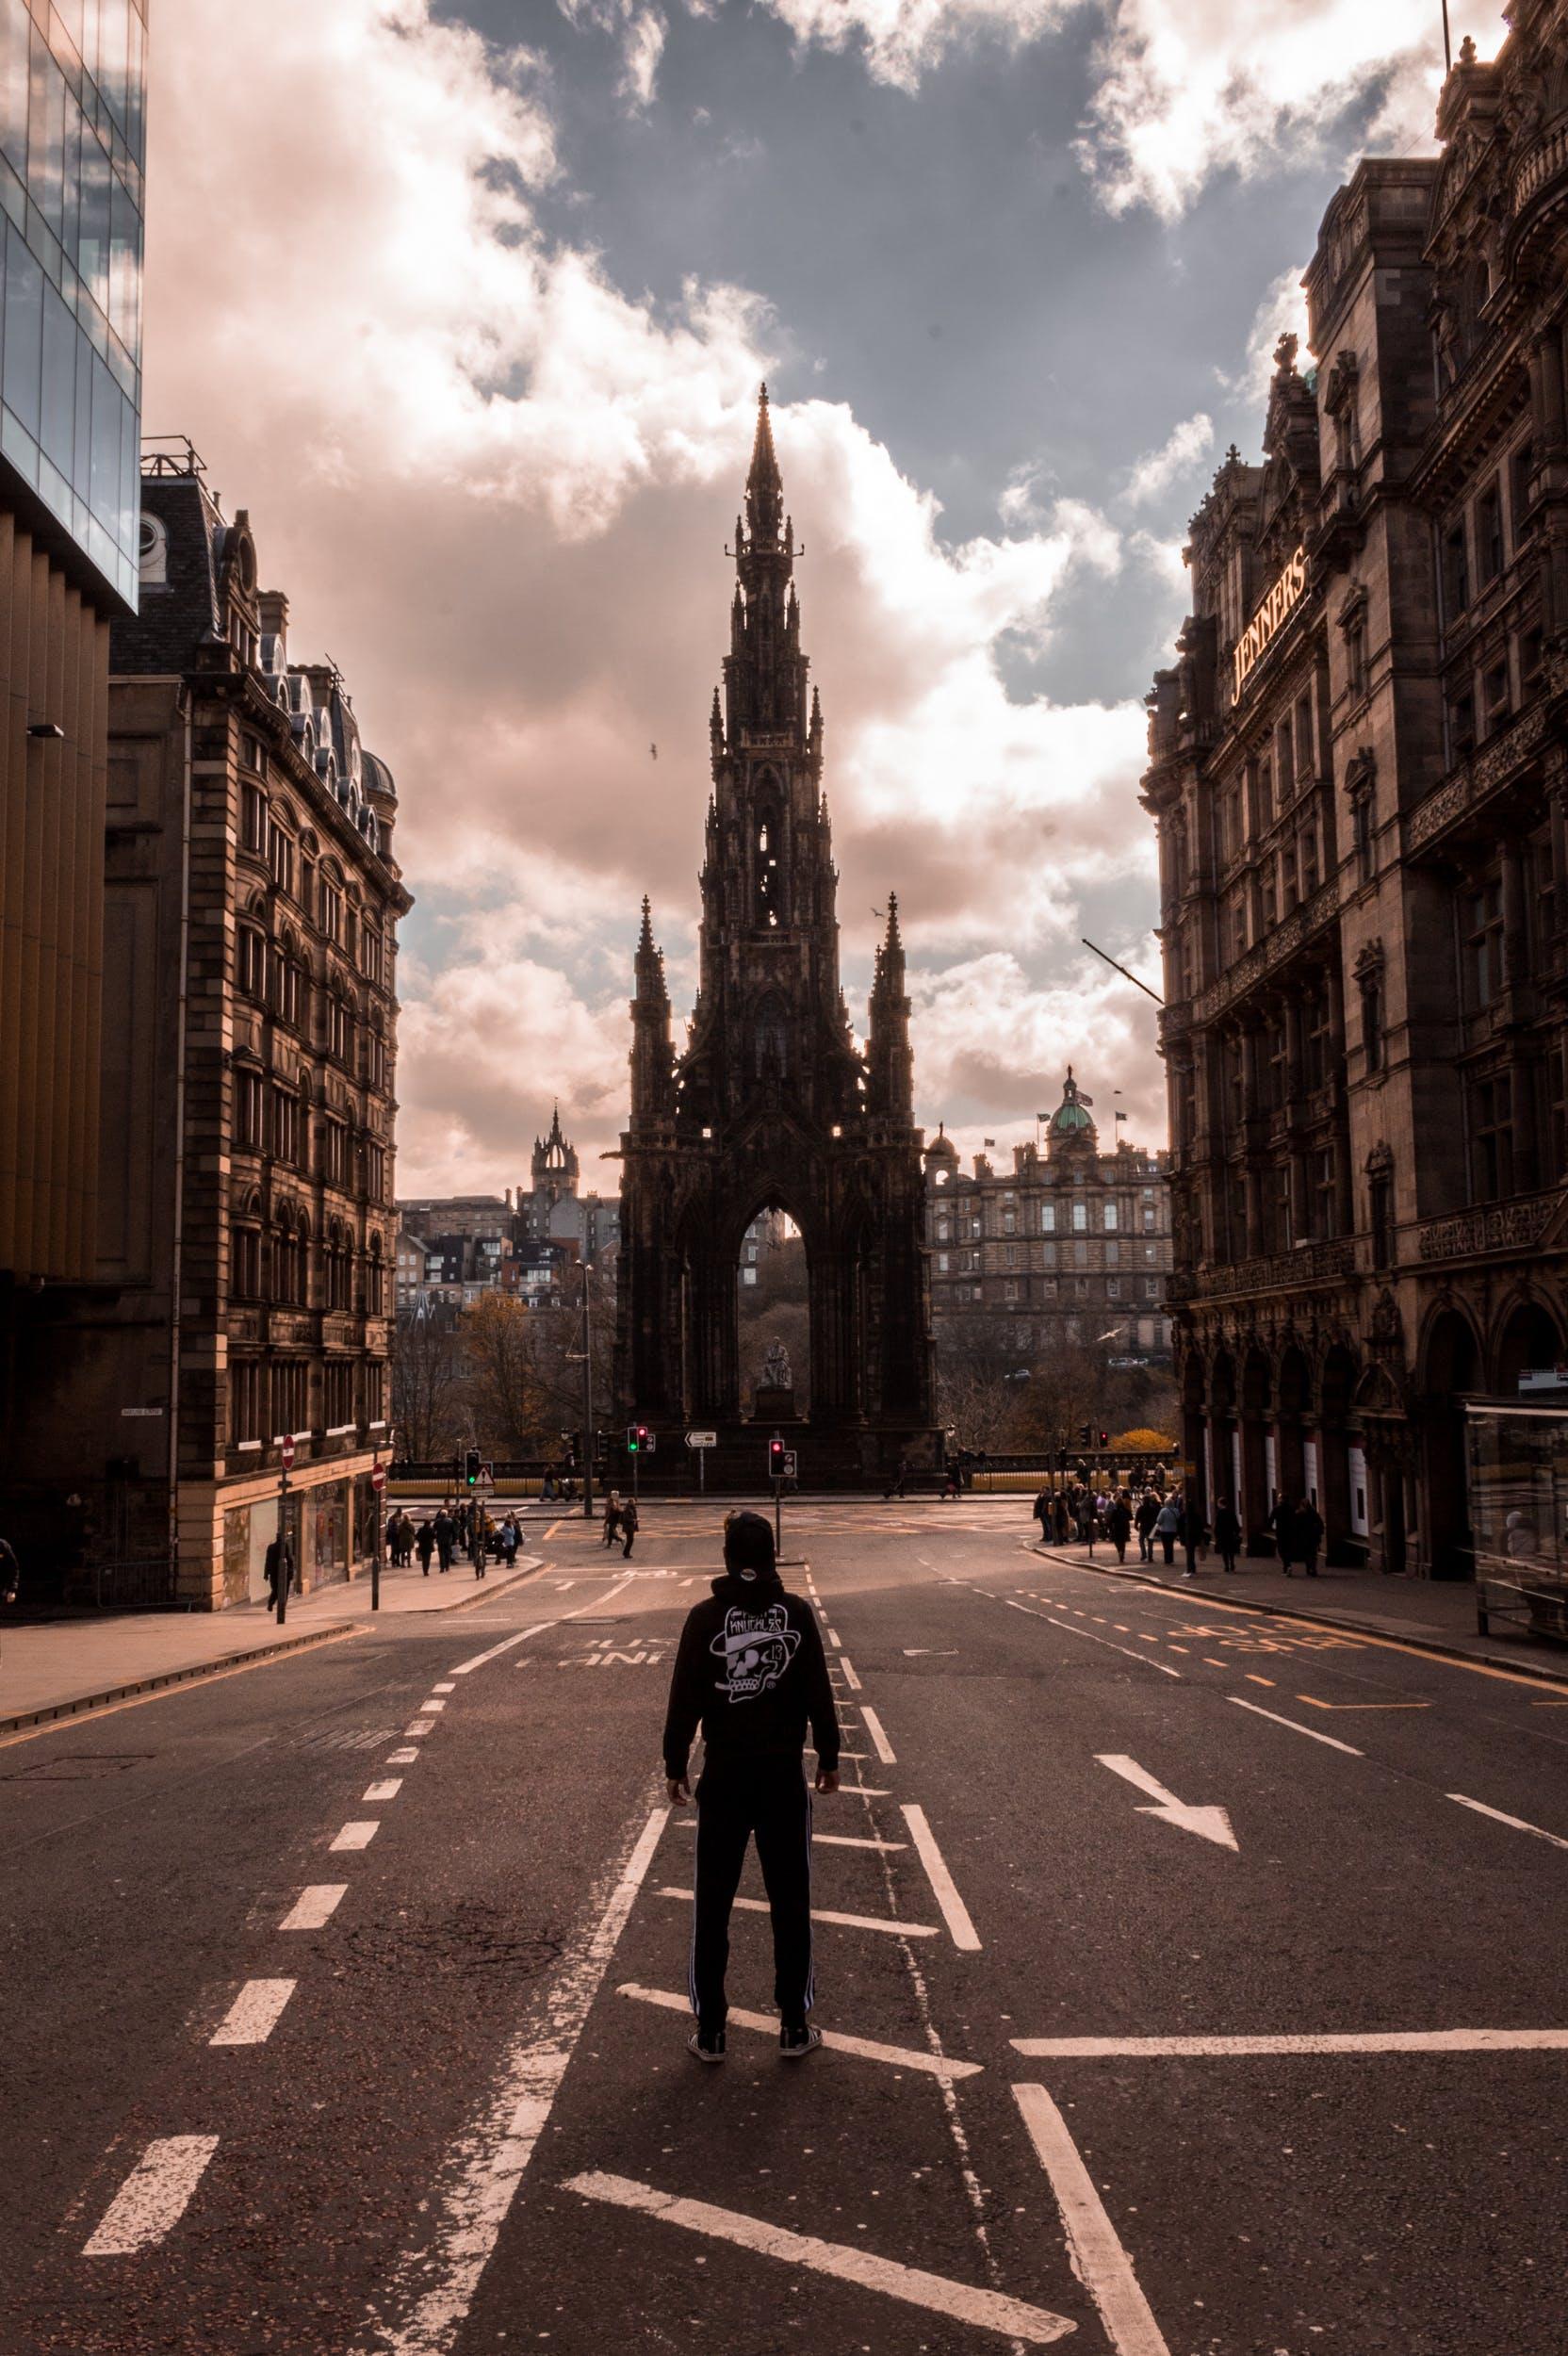 Kostnadsfri bild av arkitektur, byggnader, edinburgh, gata